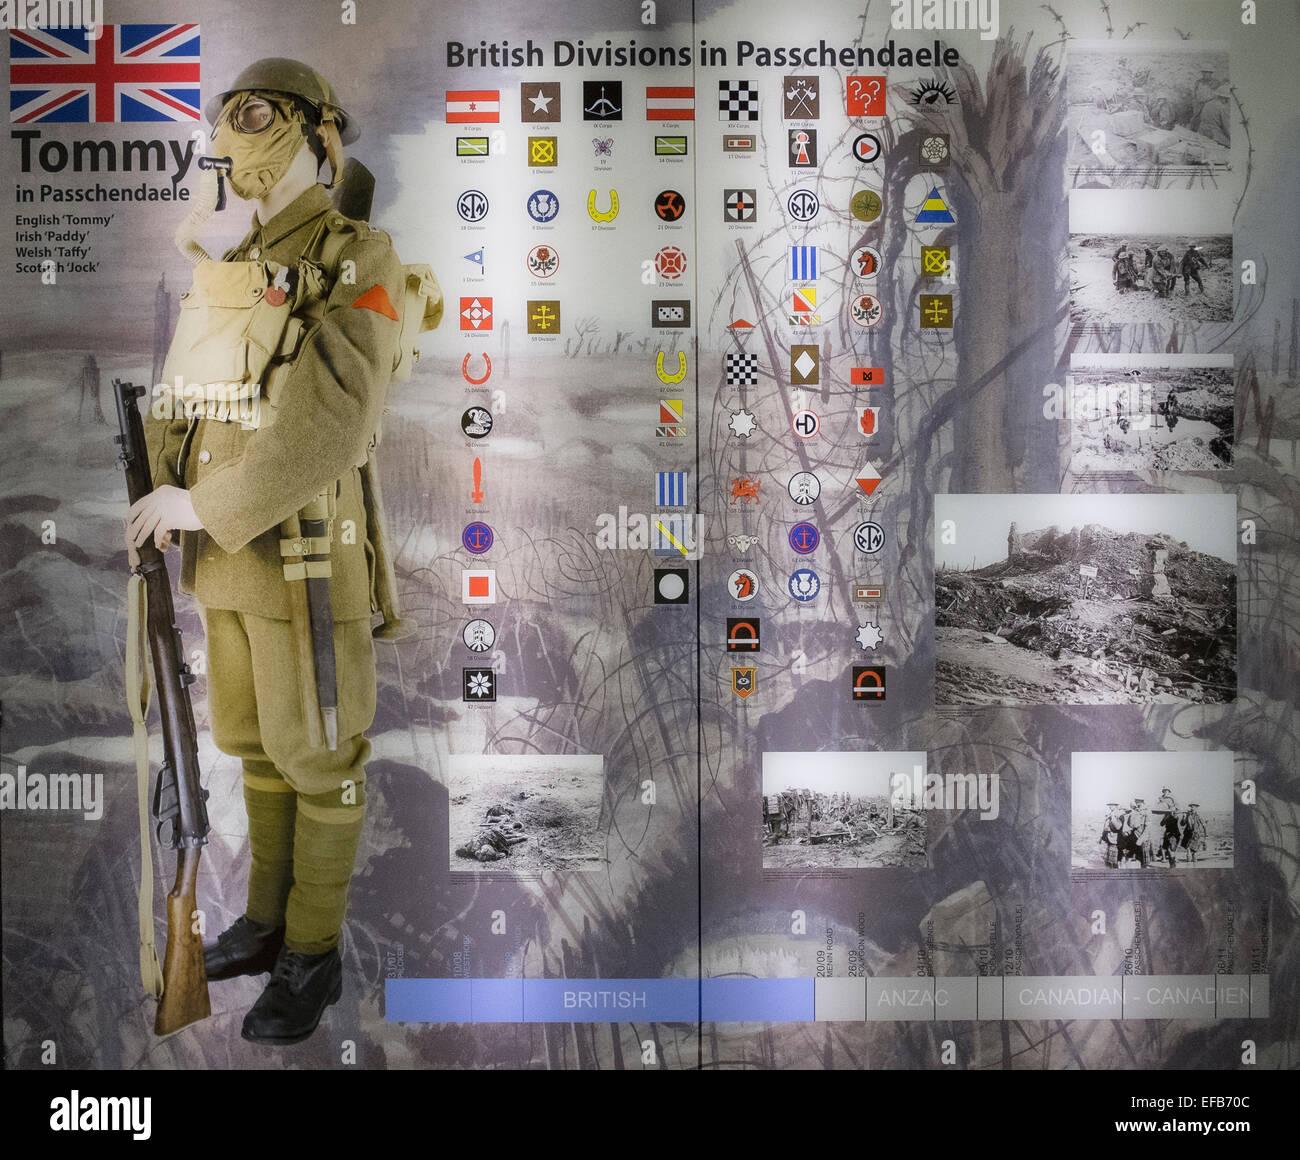 first world war memorabilia - Stock Image